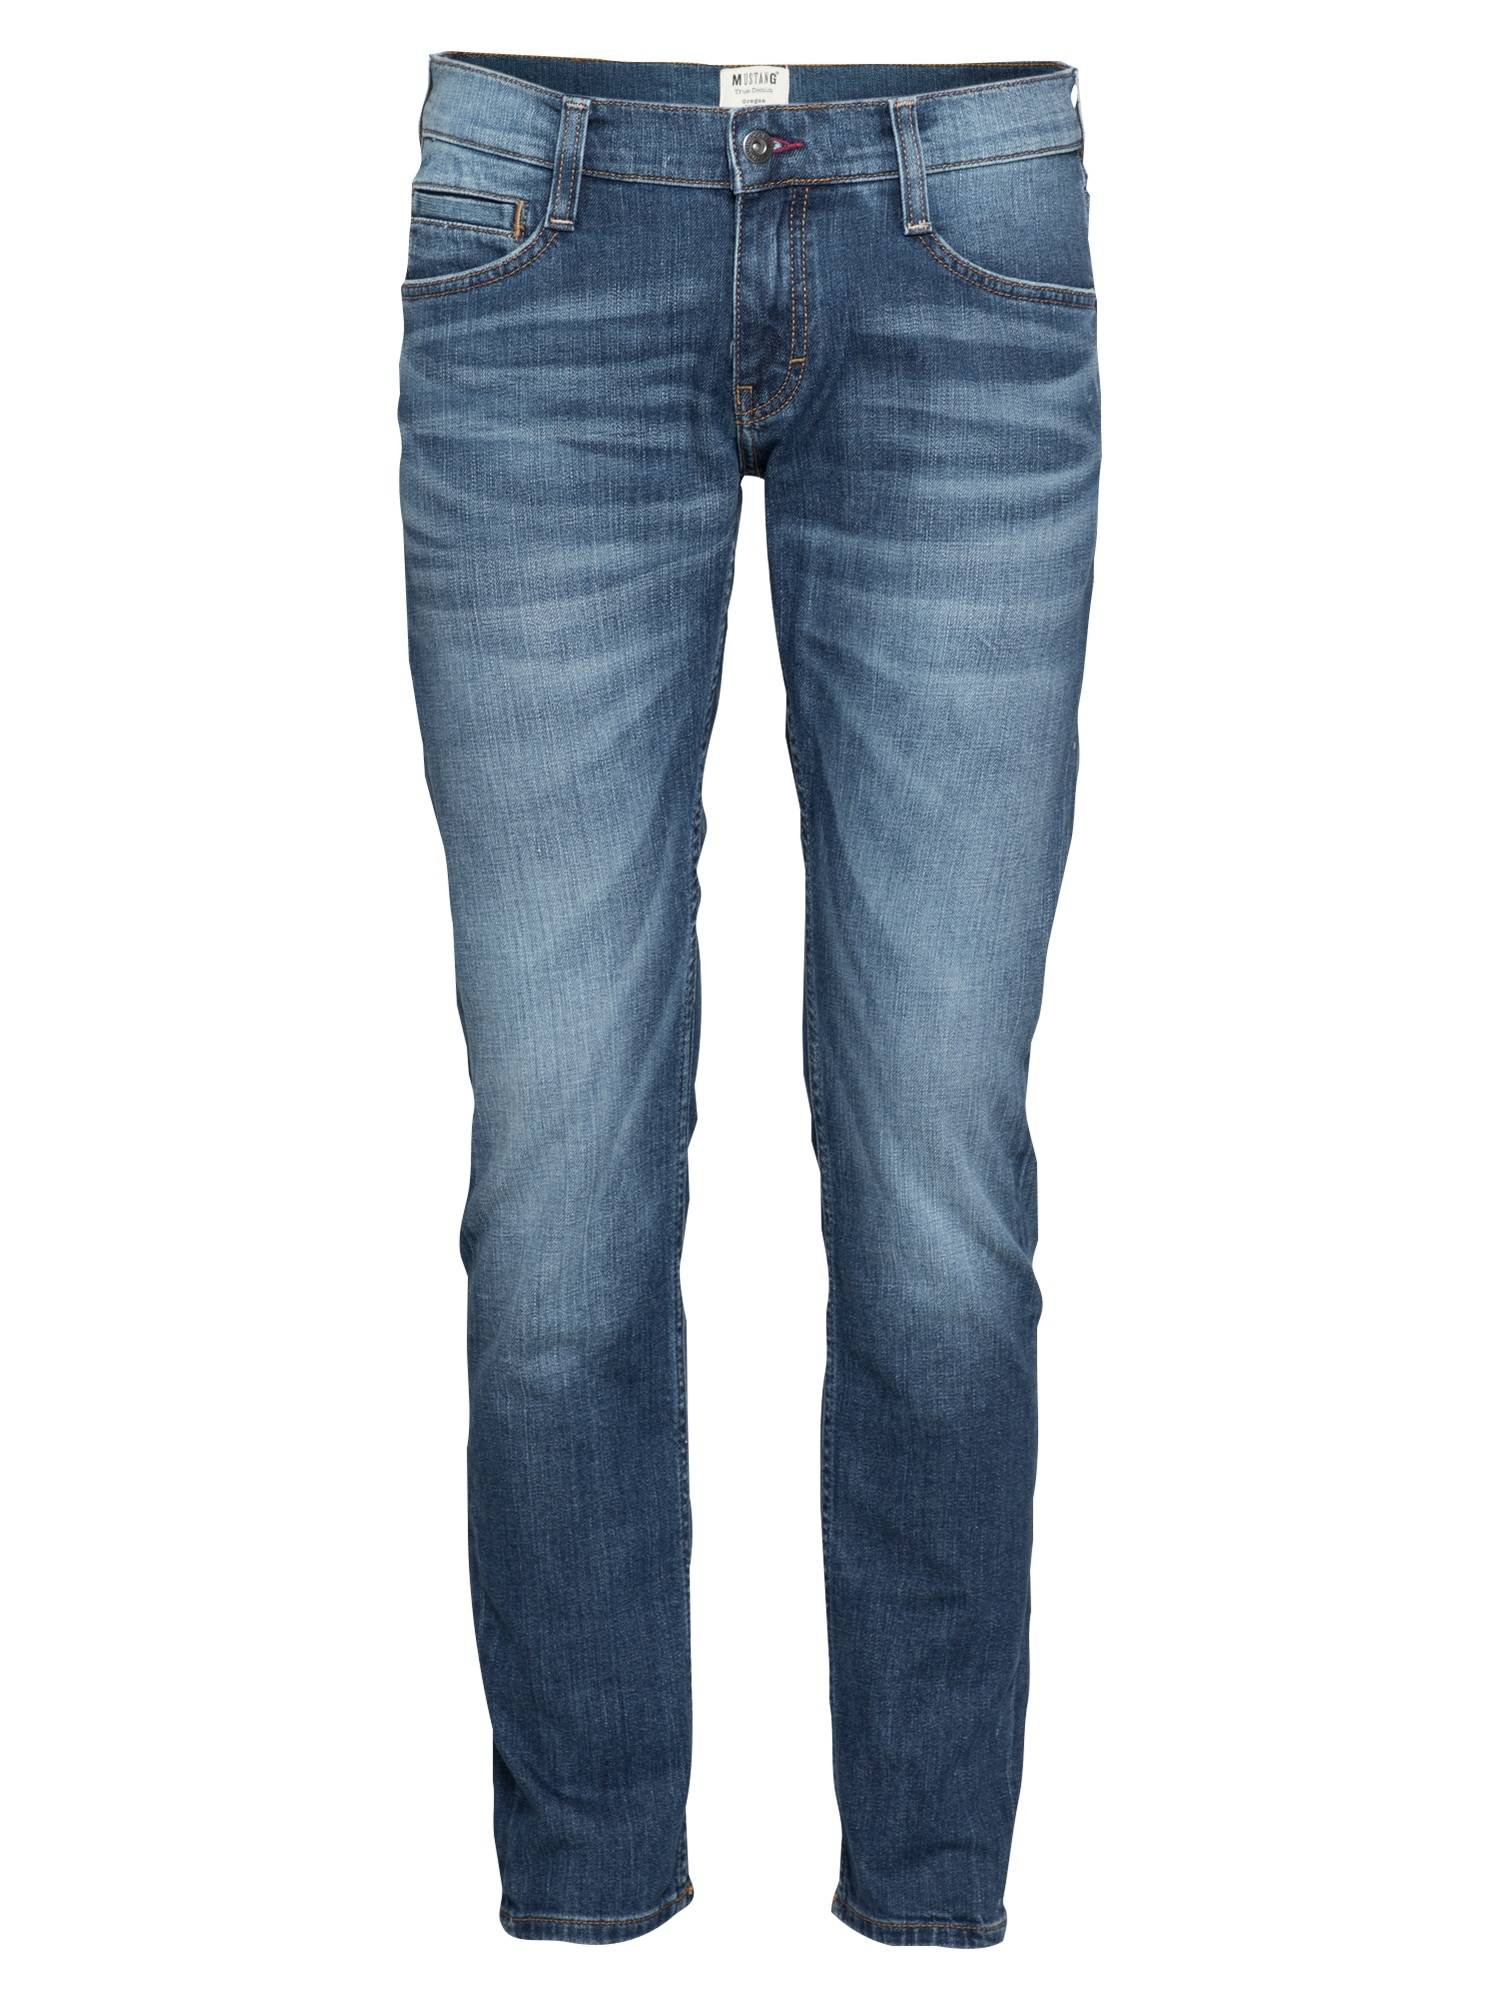 MUSTANG Jean 'Oregon'  - Bleu - Taille: 32 - male